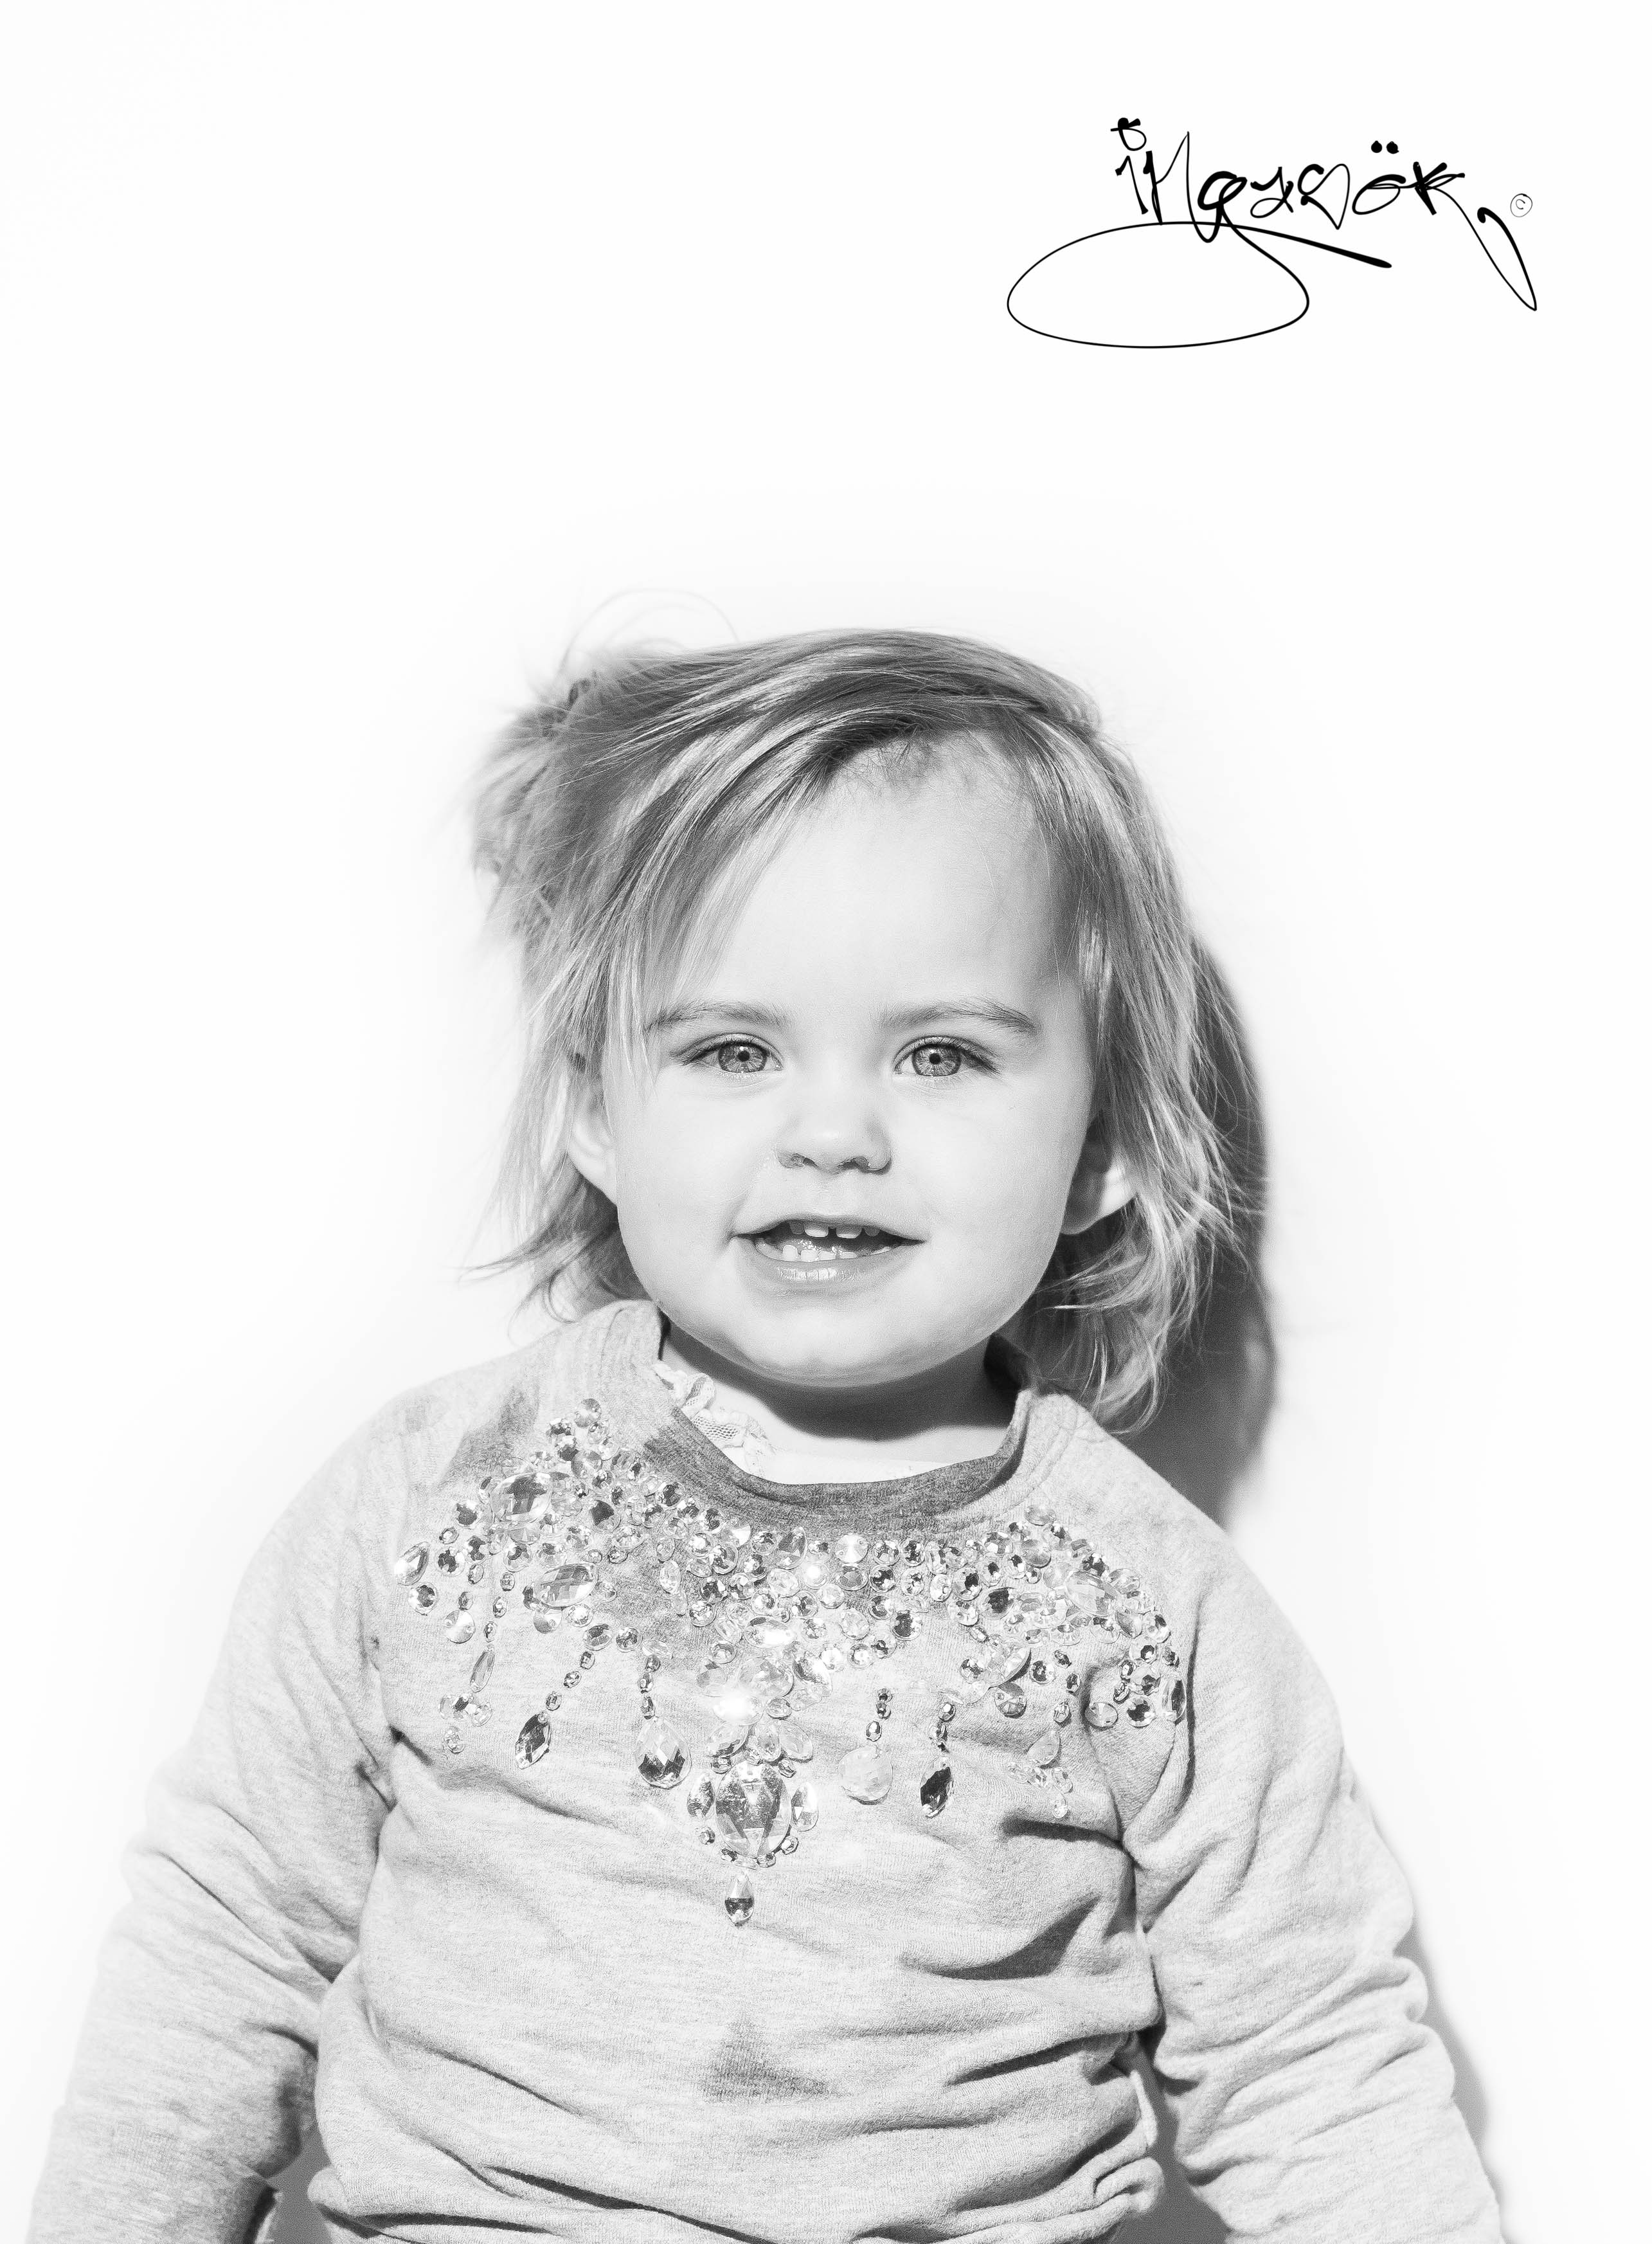 Photographed by Inga Sör - Portrait